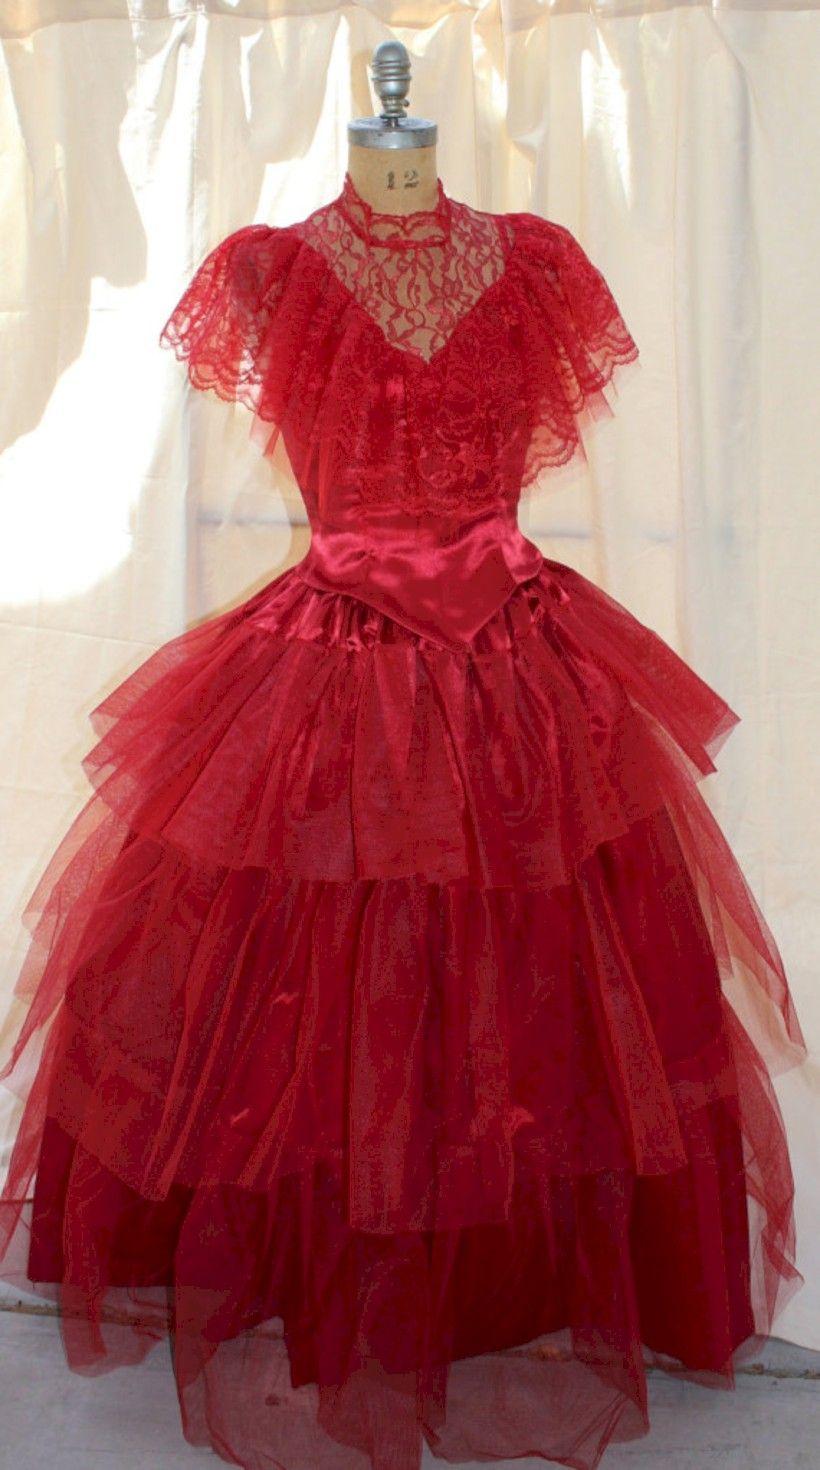 54 Scary and Creative DIY Halloween Wedding Dress Ideas